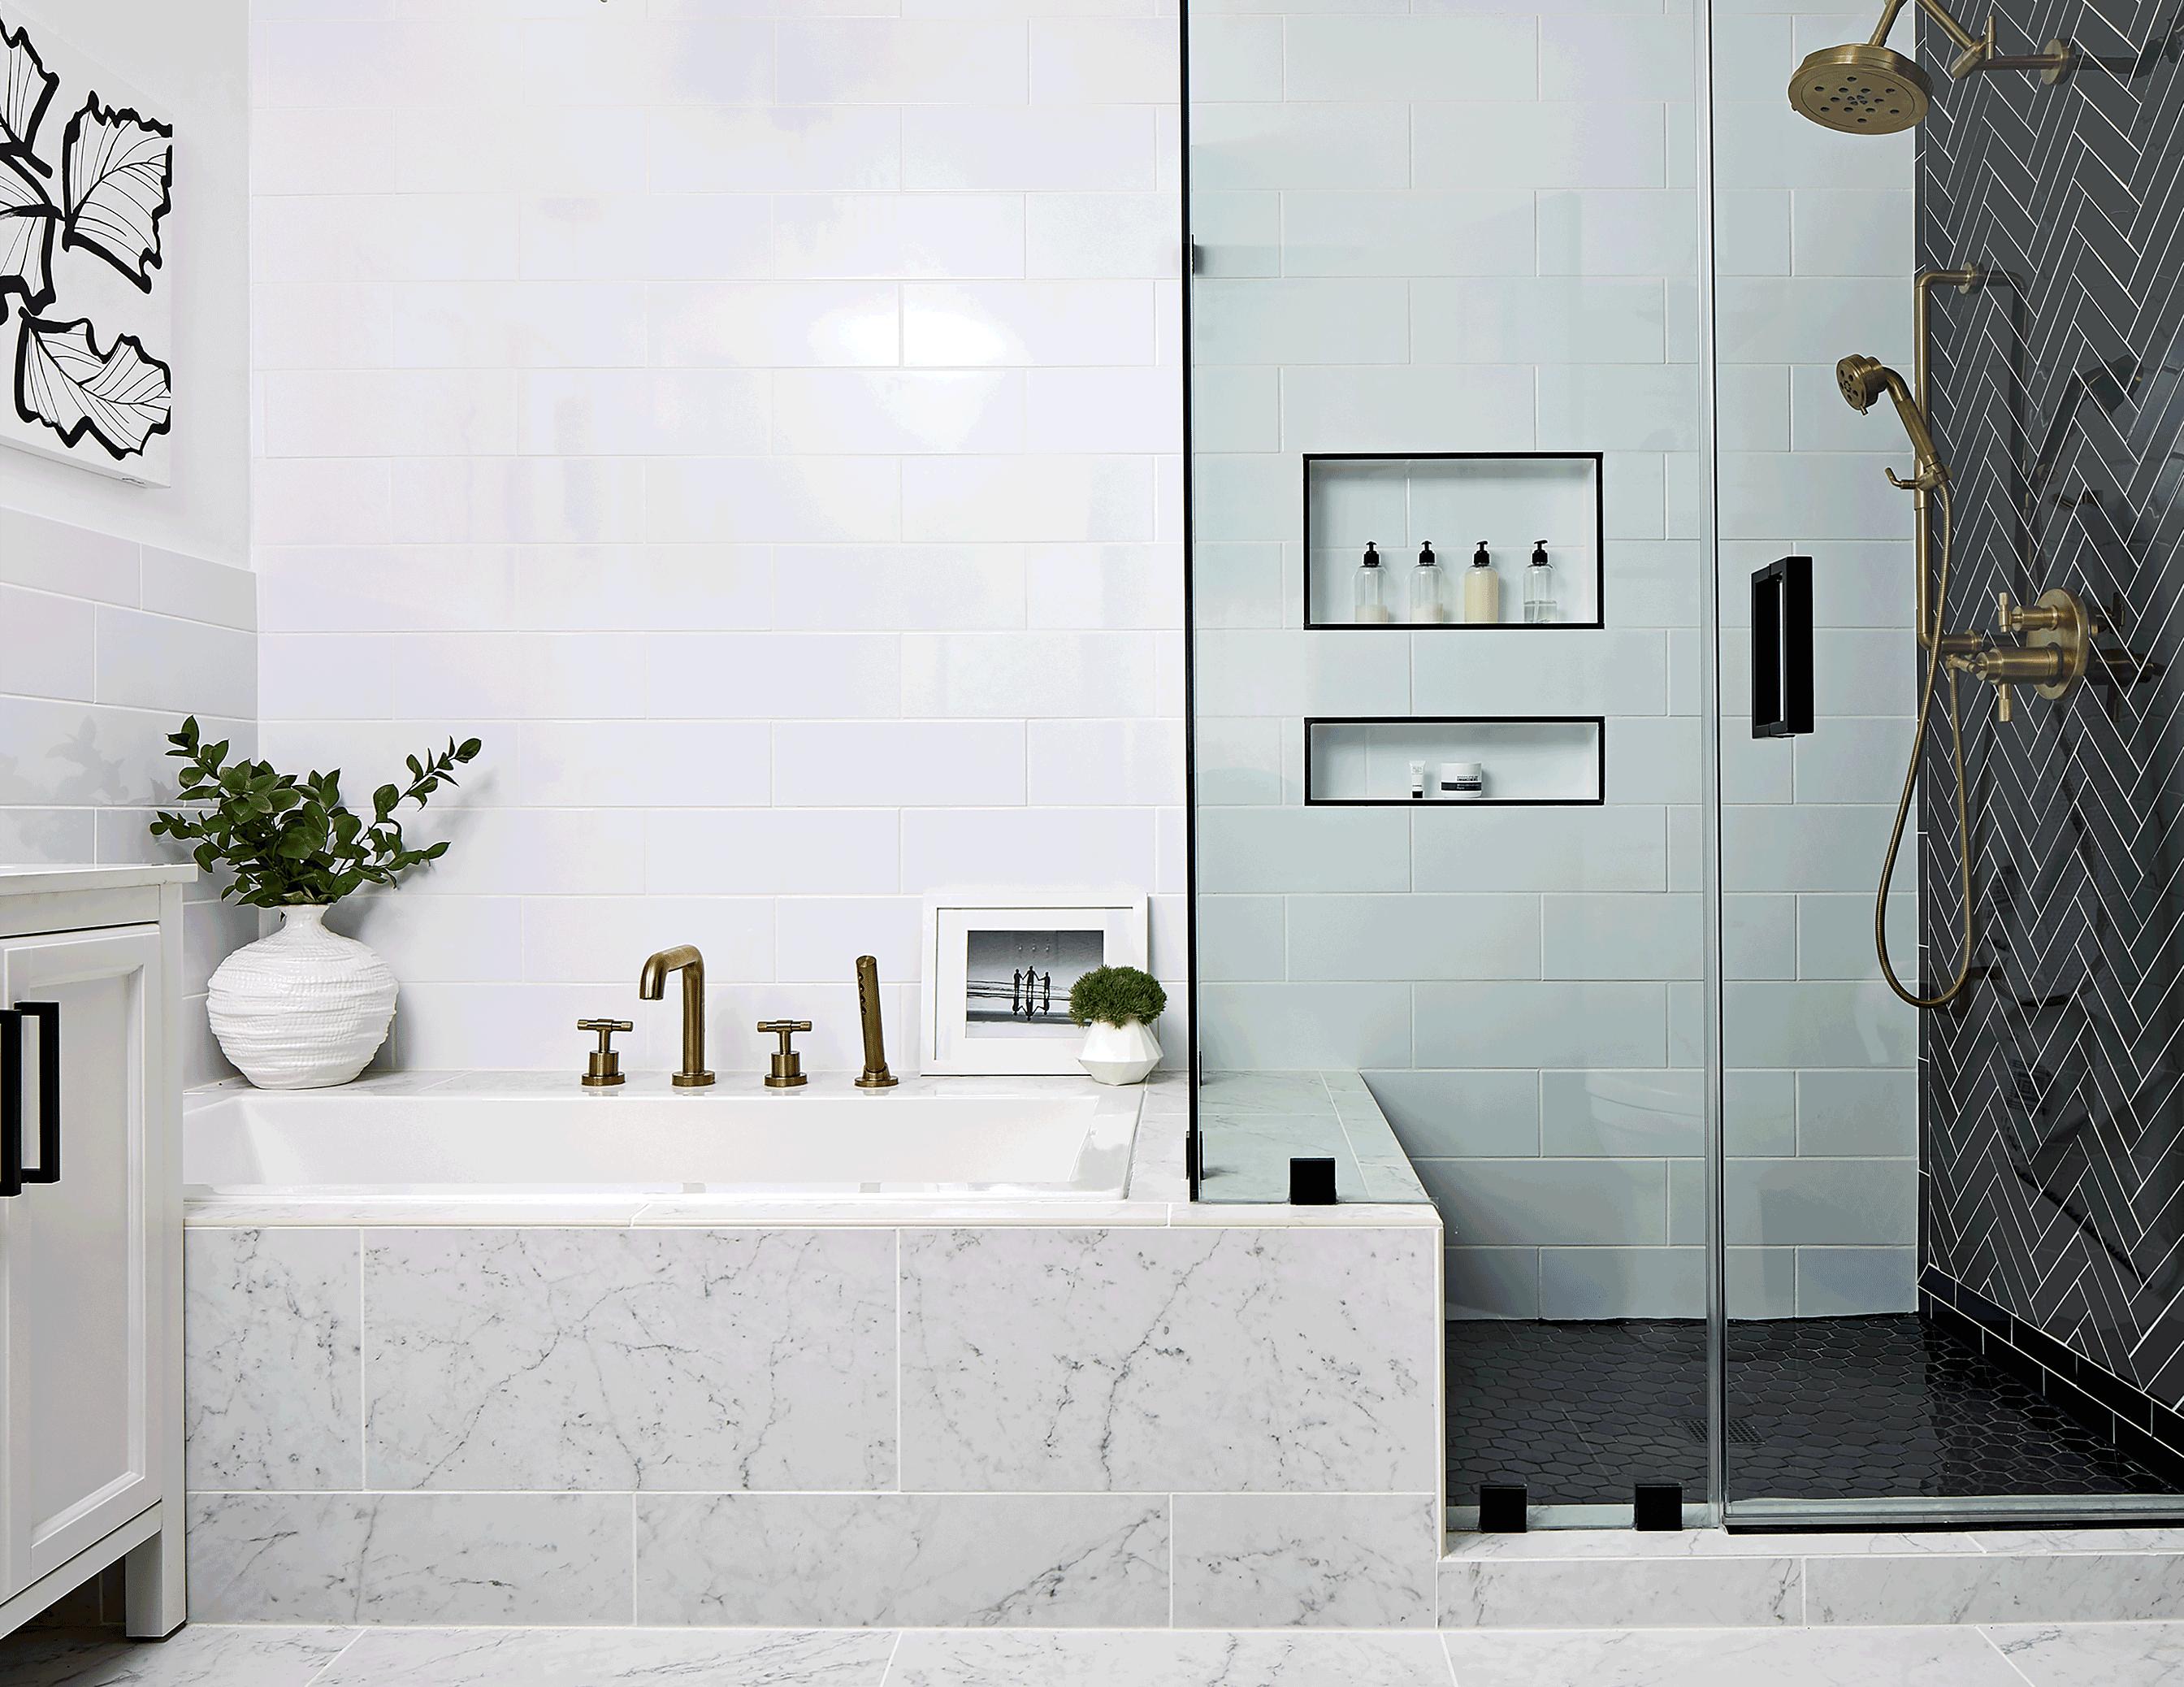 white bathroom with black fixtures